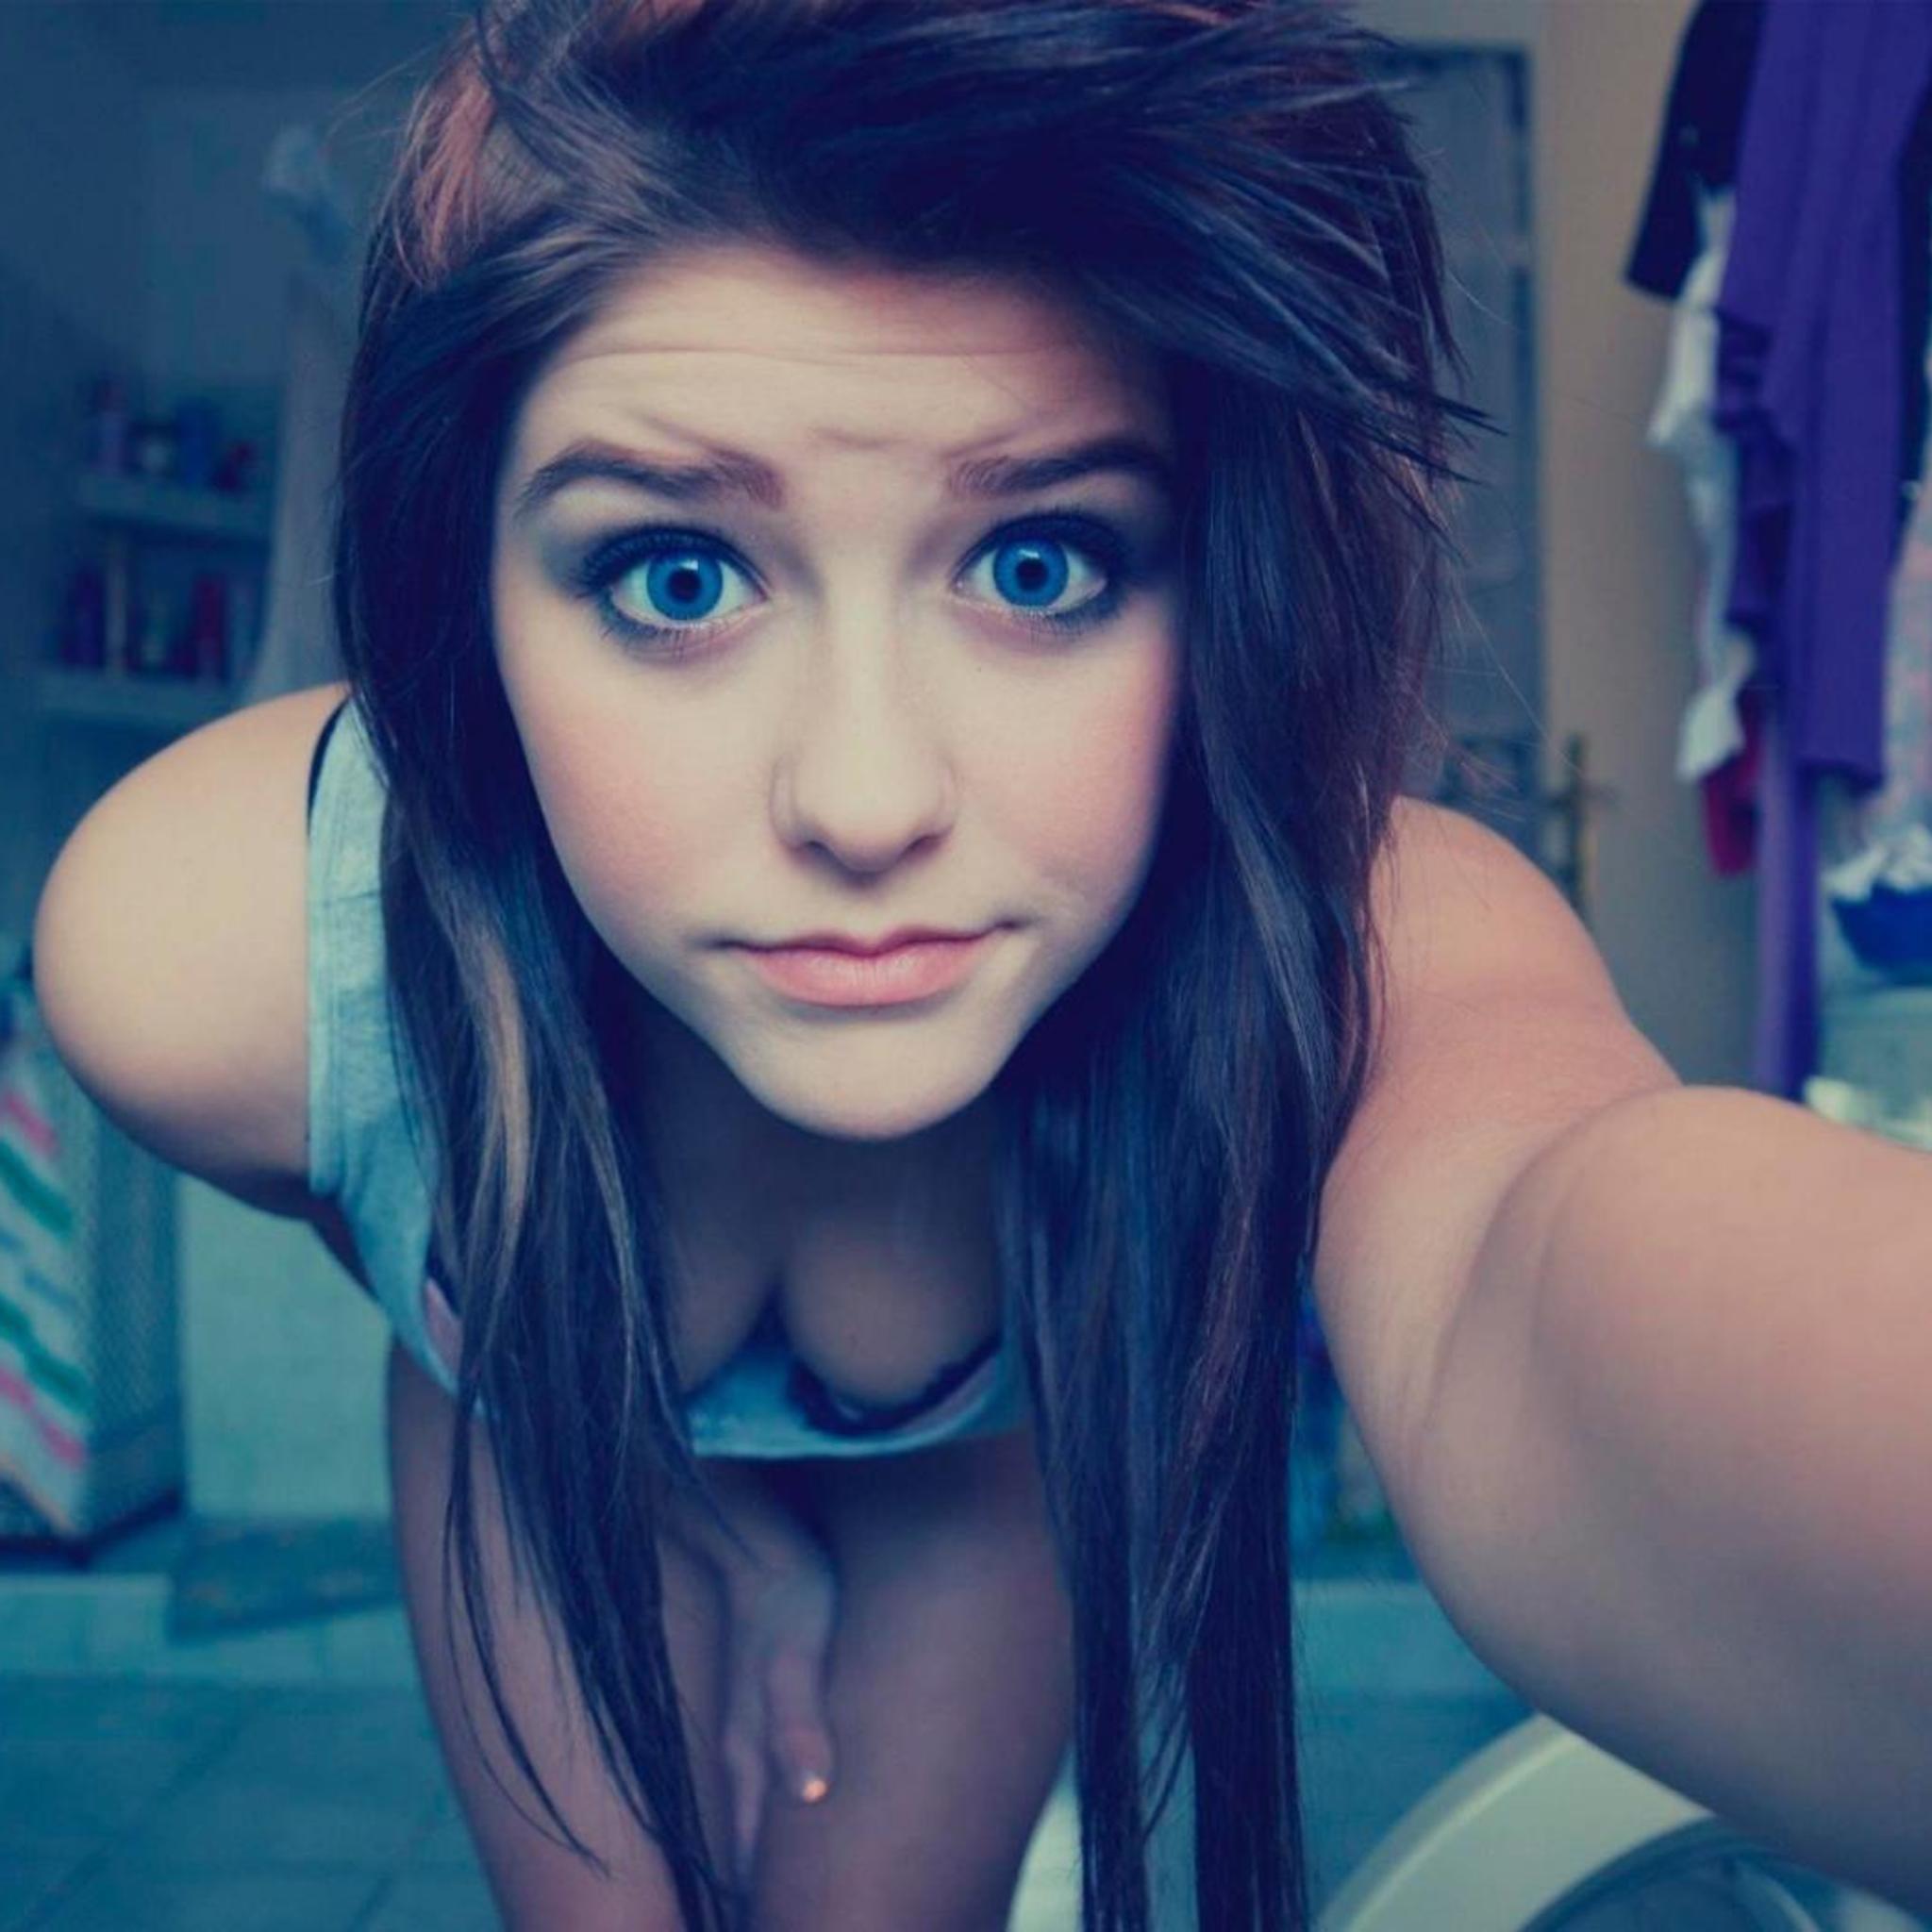 cute teen girl 1